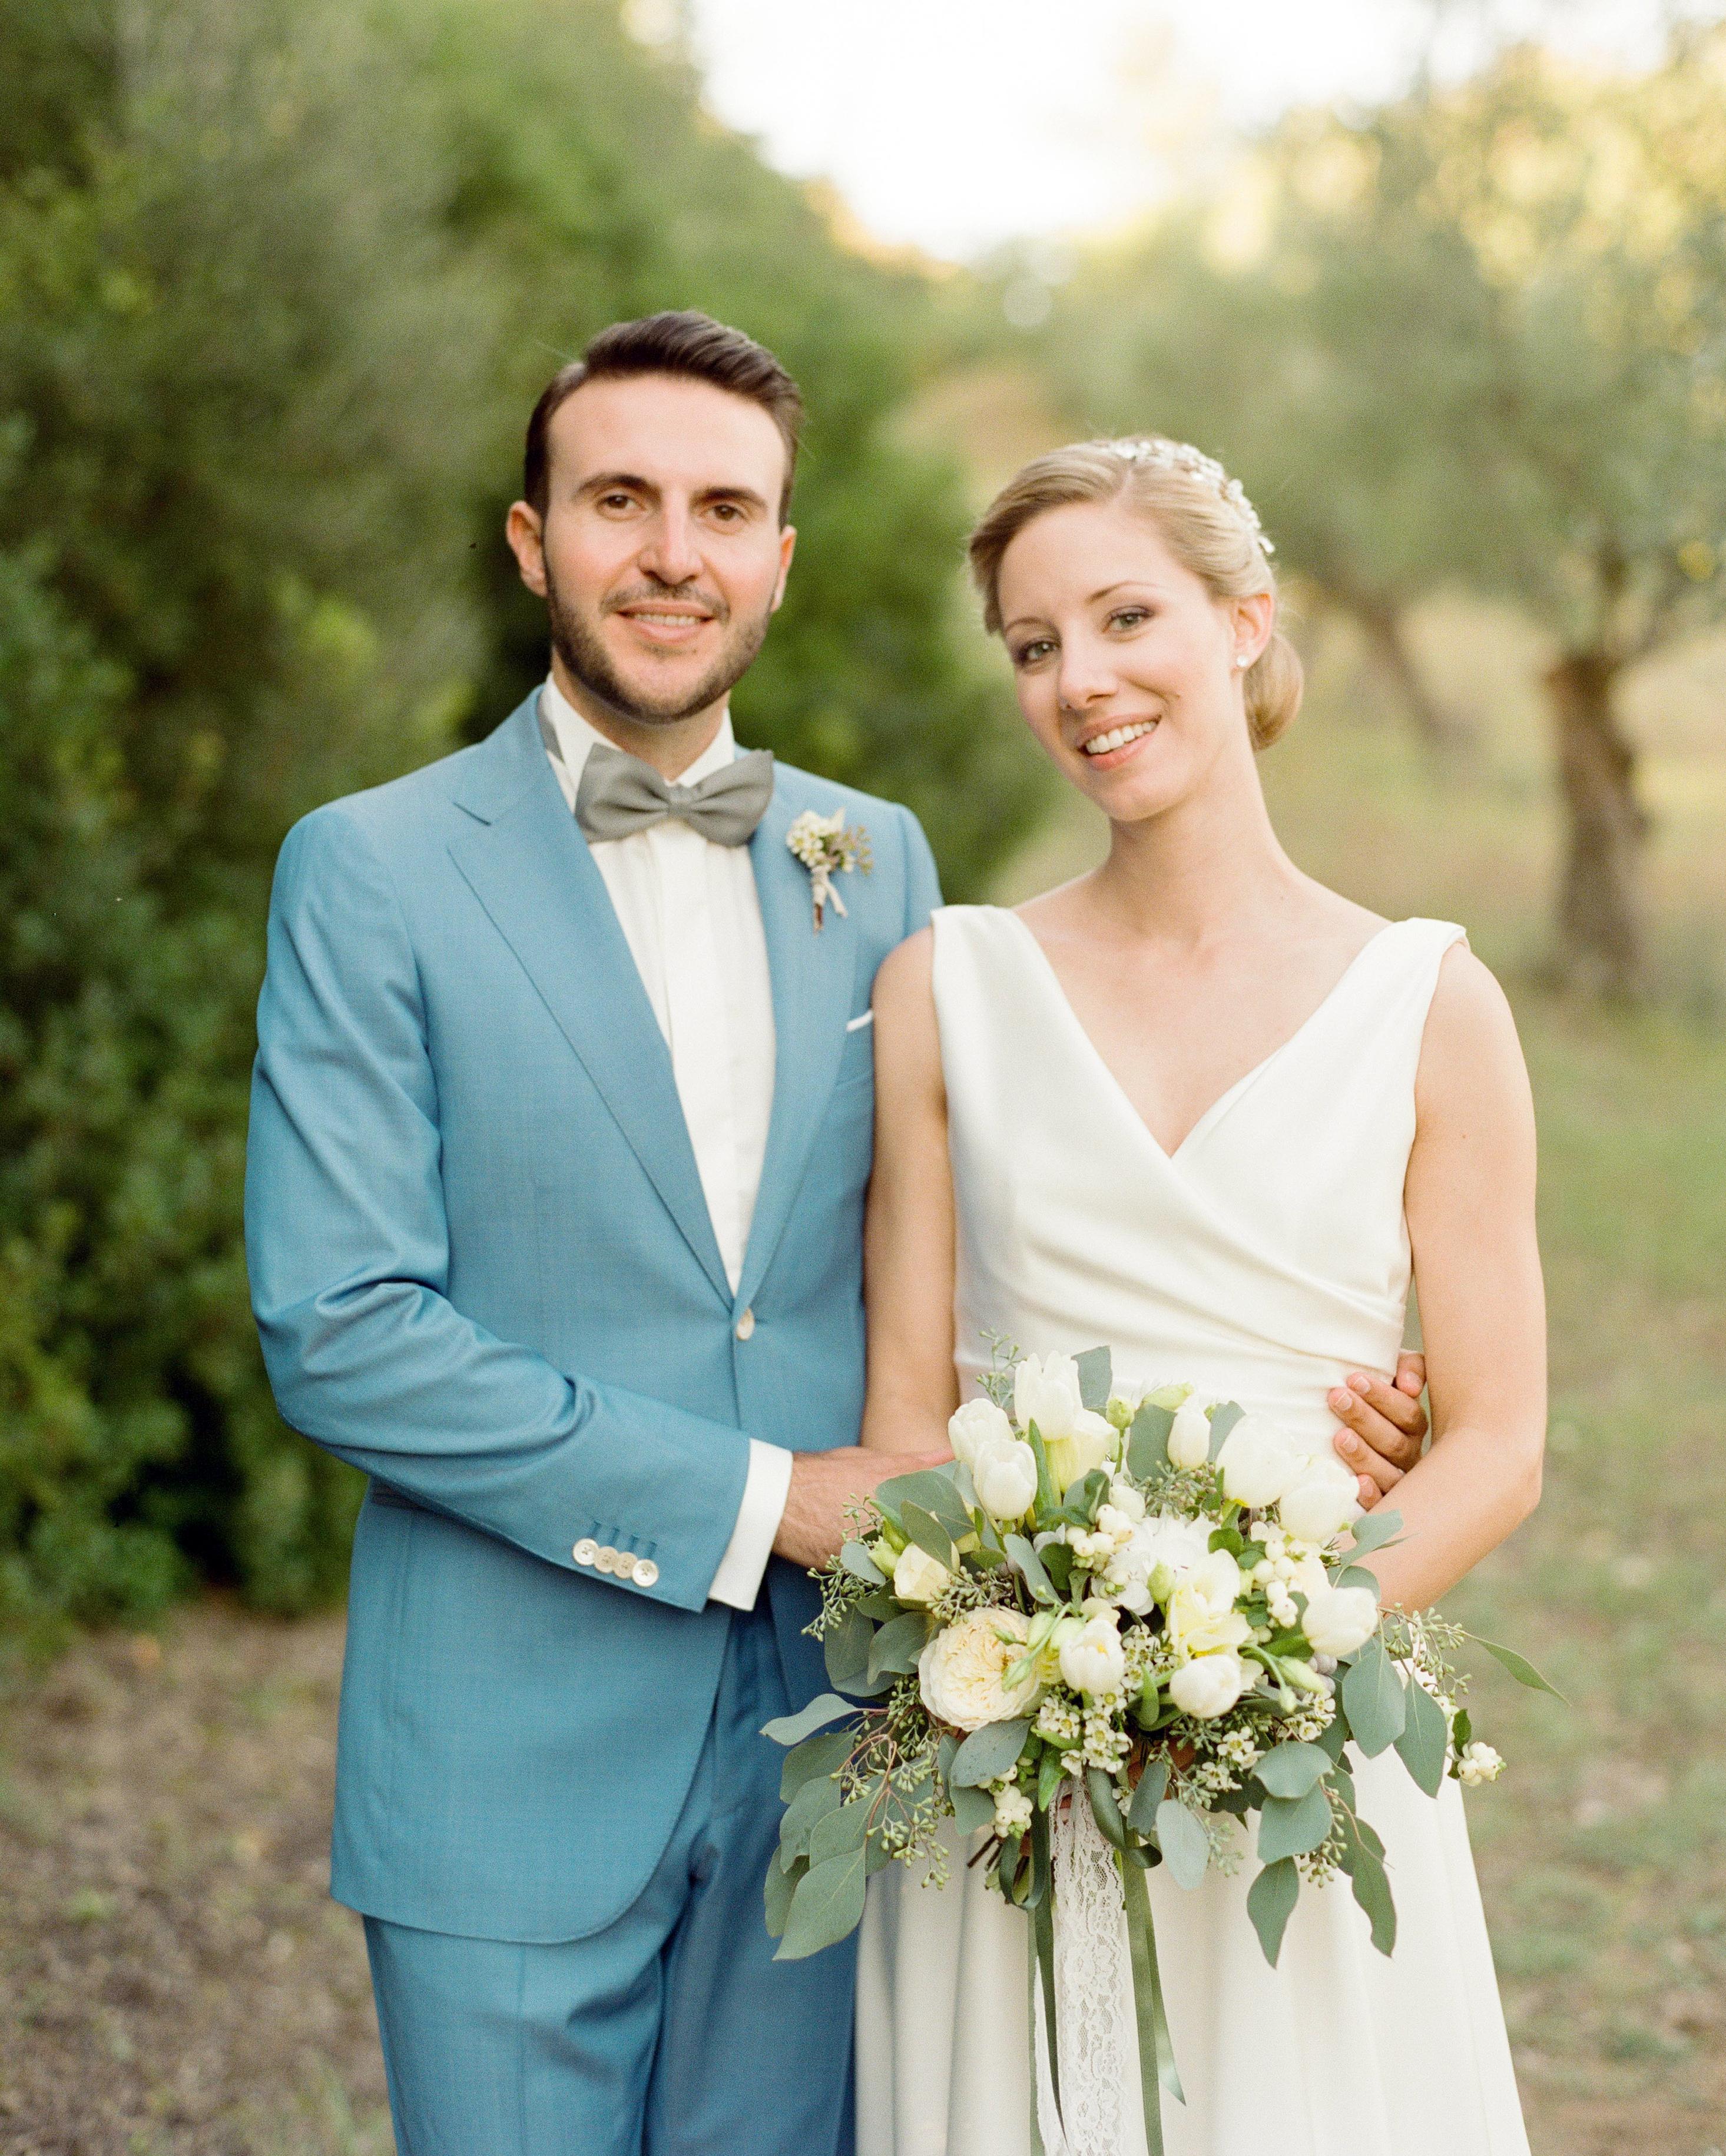 regina-jack-wedding-couple-43-s111820-0215.jpg